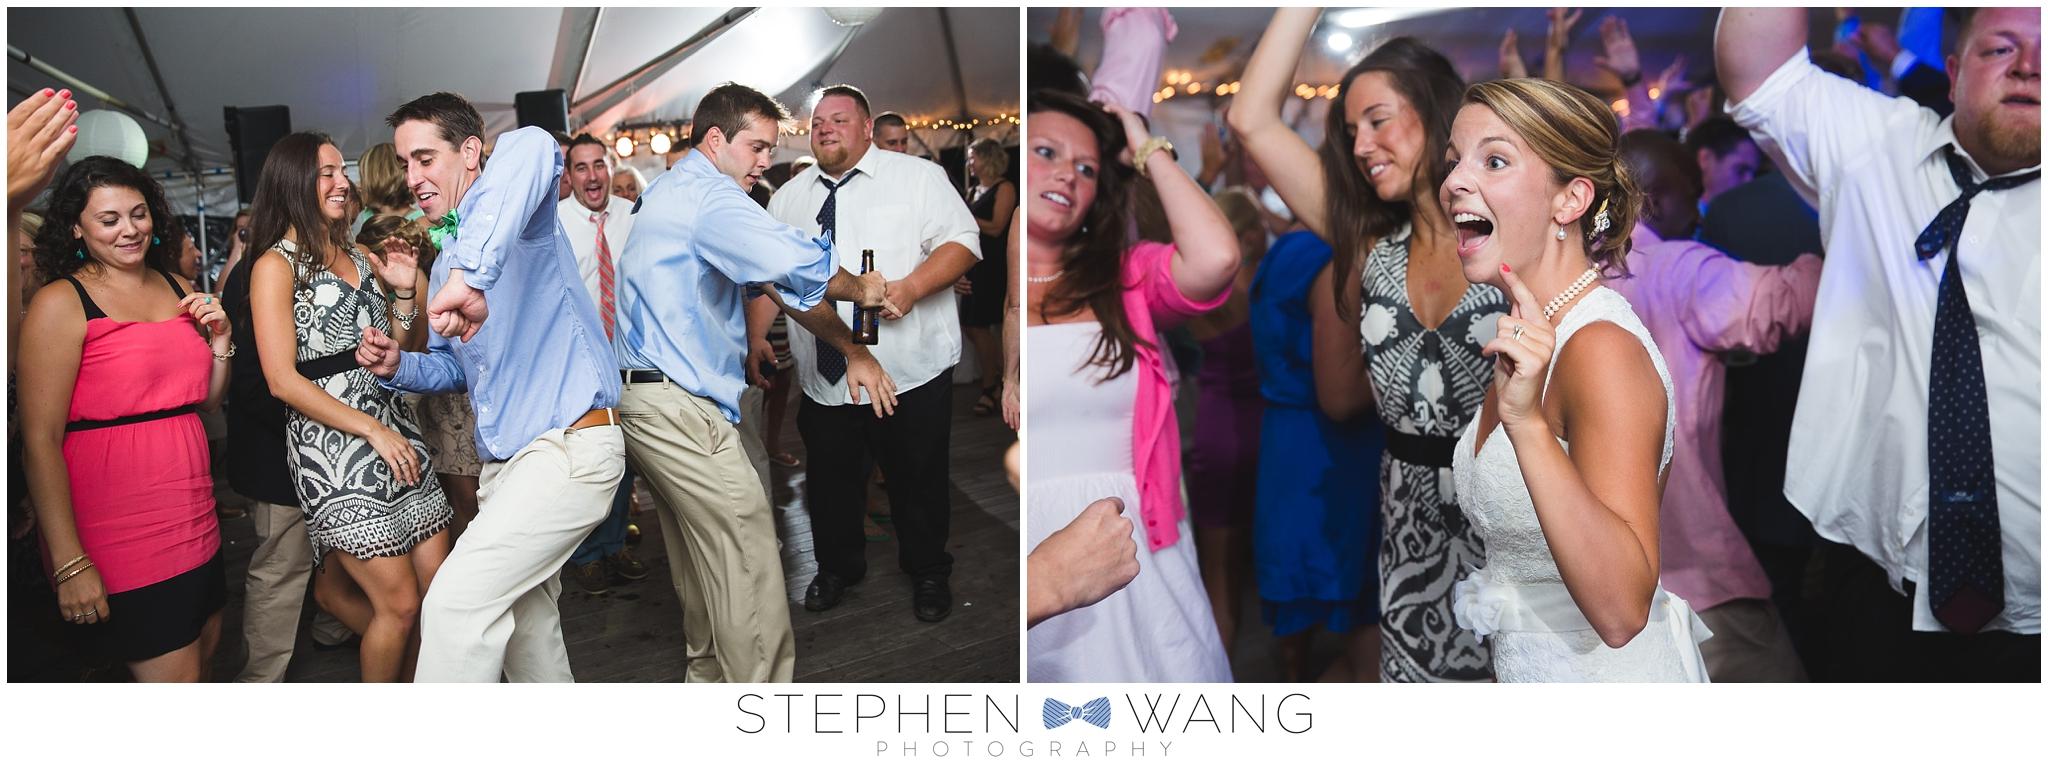 Stephen Wang Photography Madison Surf Club Wedding Photogrpahy CT Connecticut Shoreline Beach Summer Sunset -08-12_0034.jpg